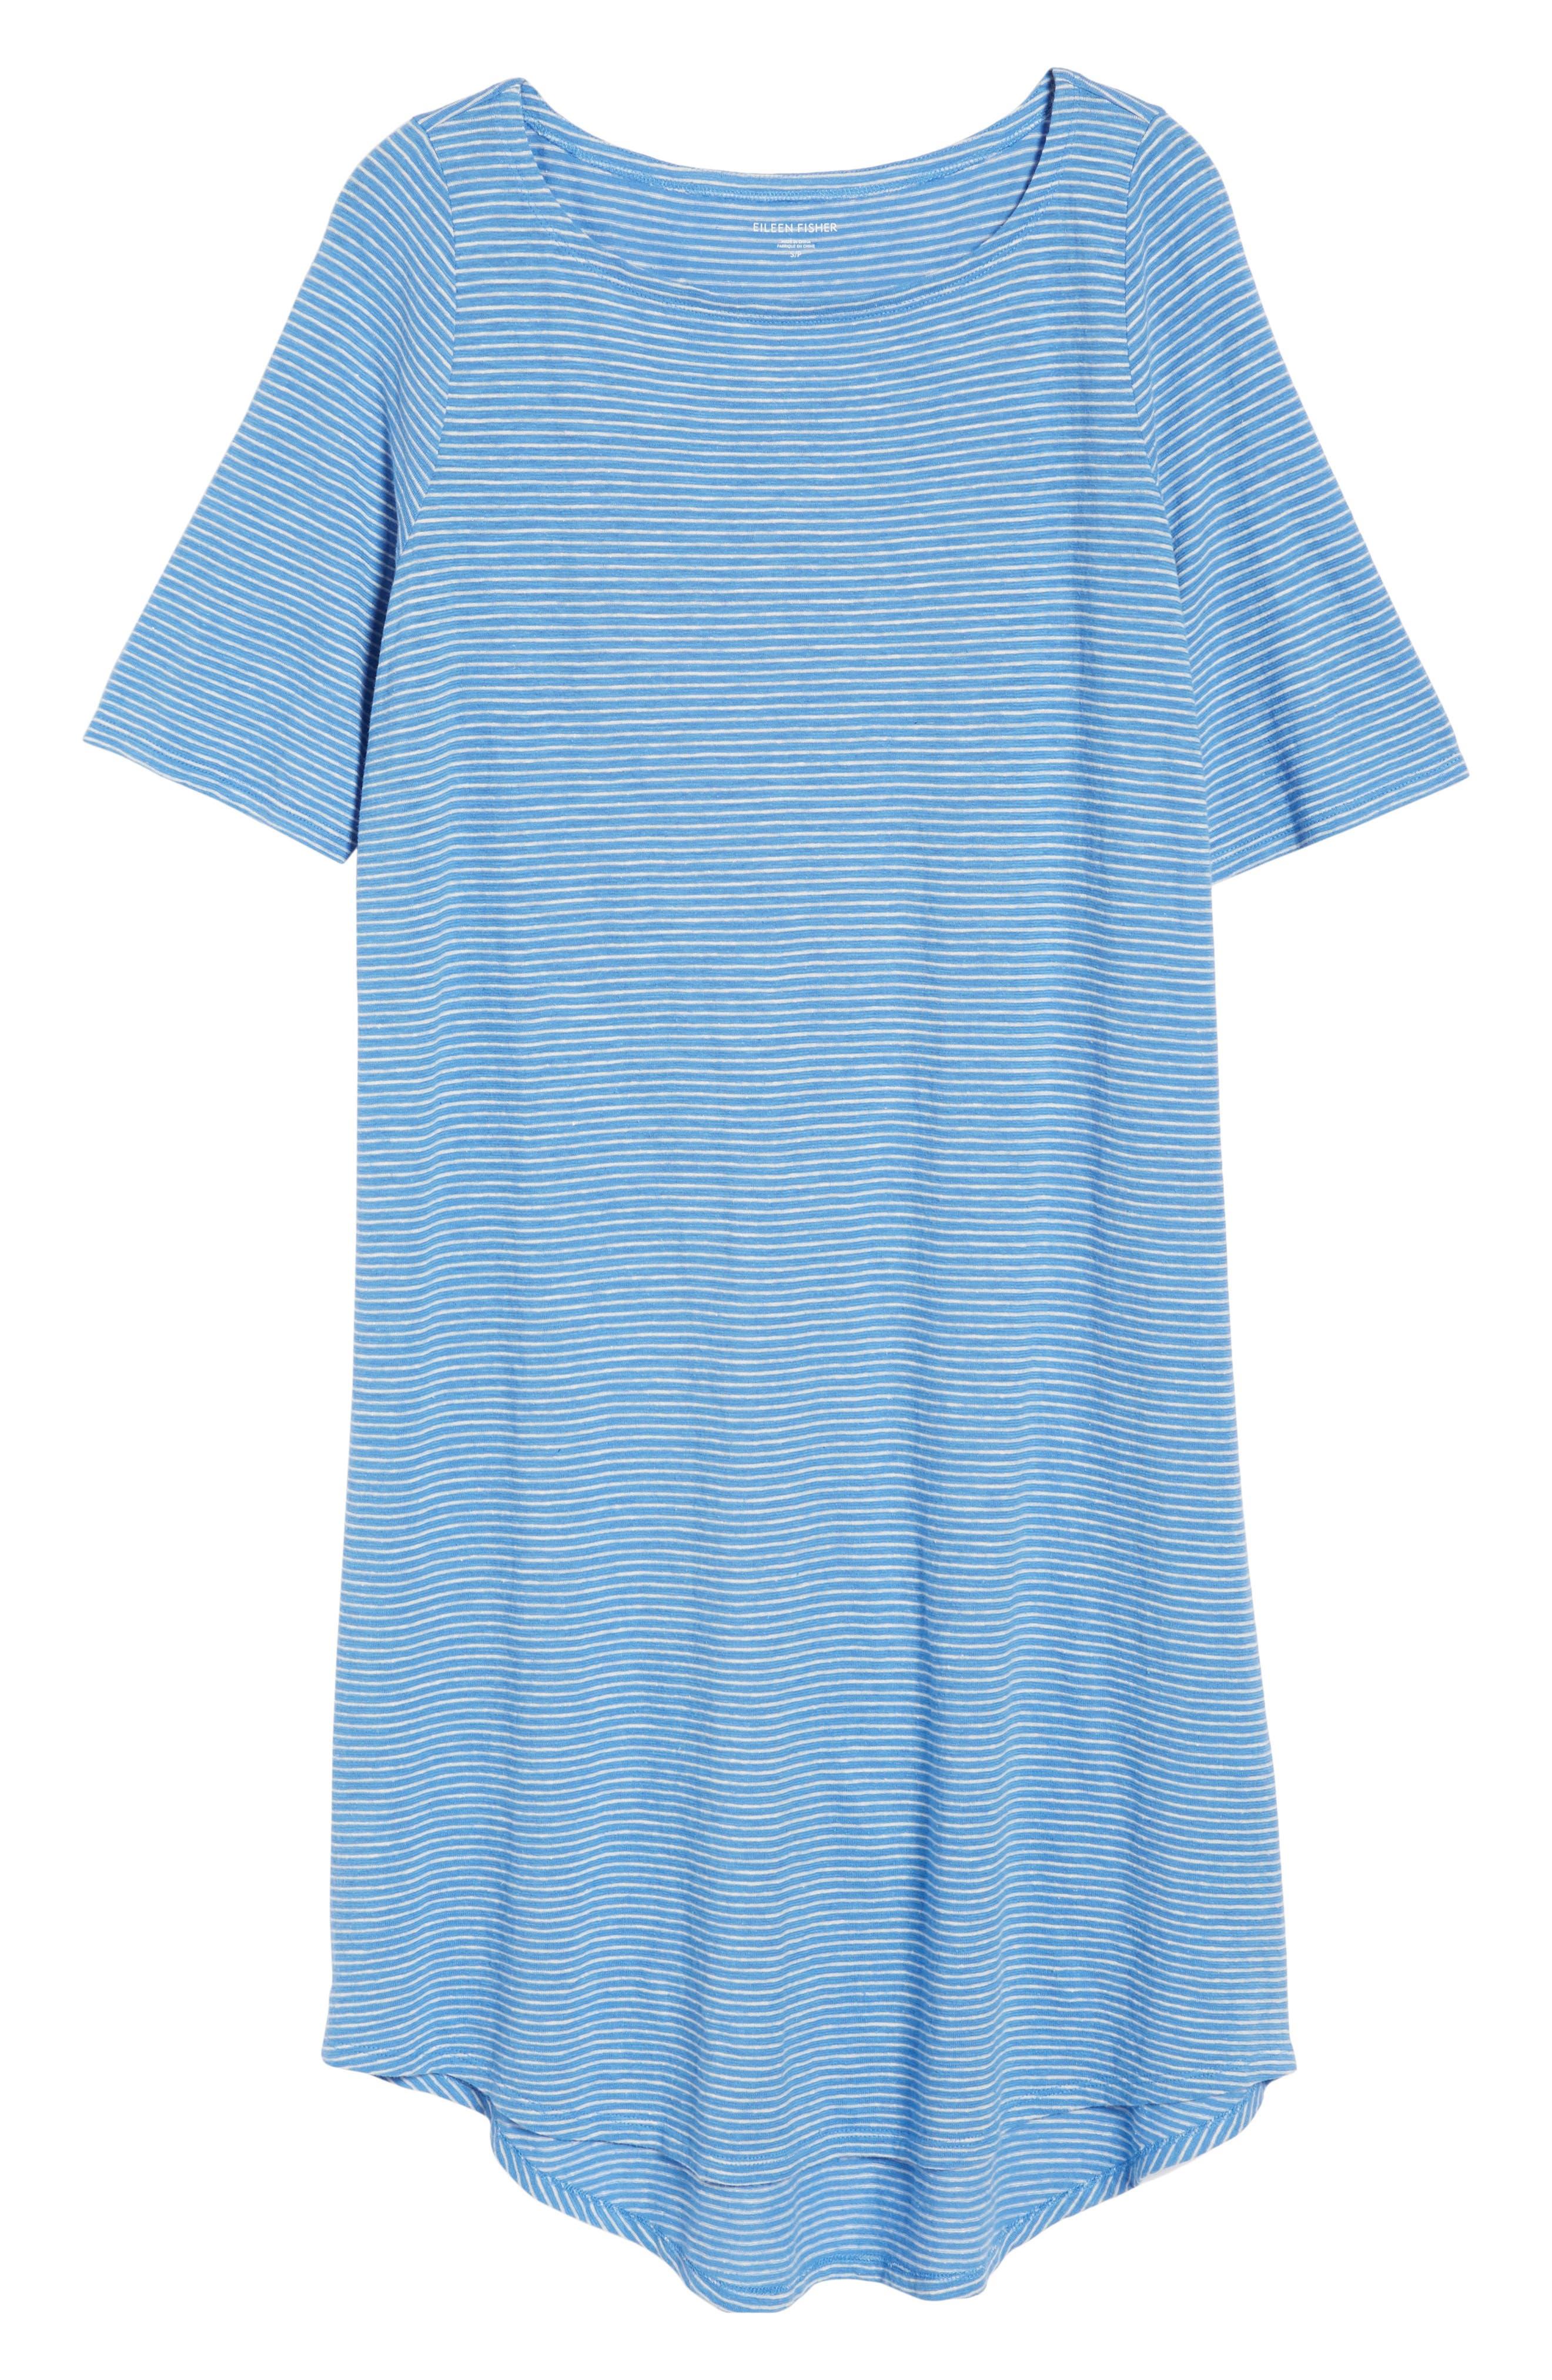 Hemp & Organic Cotton Jersey Dress,                             Alternate thumbnail 6, color,                             Bluebell